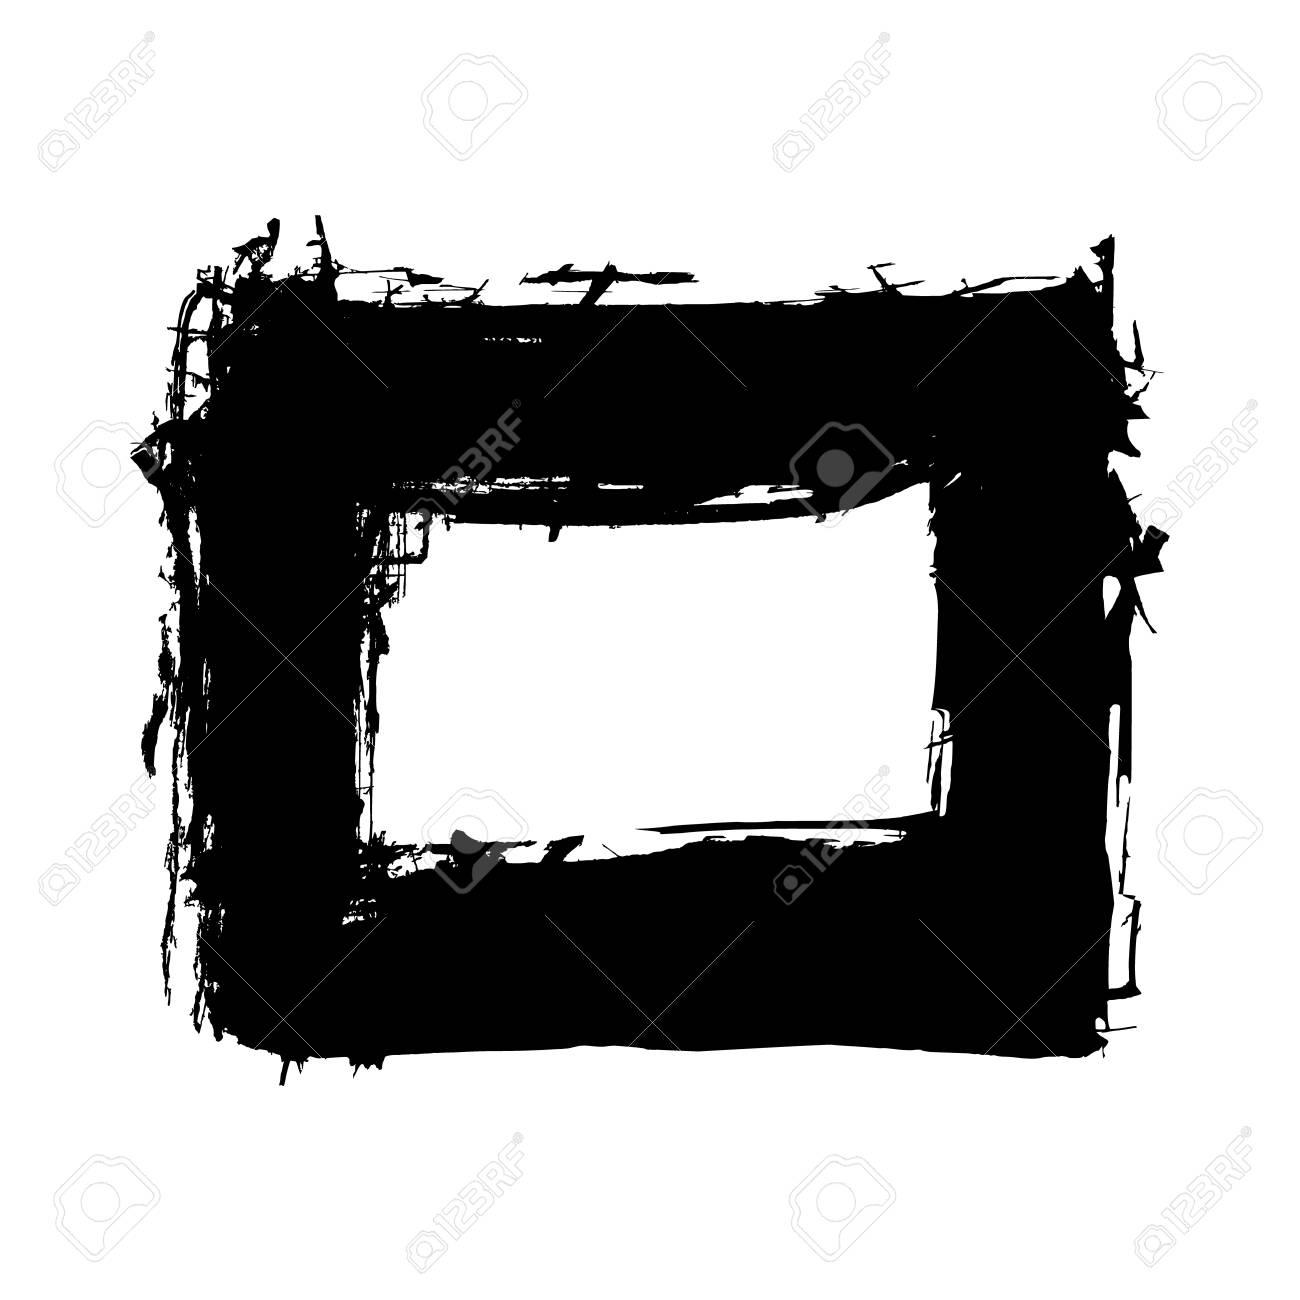 Hand Drawn Abstract Black Paint Brush Strokes, Box, Border. Vector ...